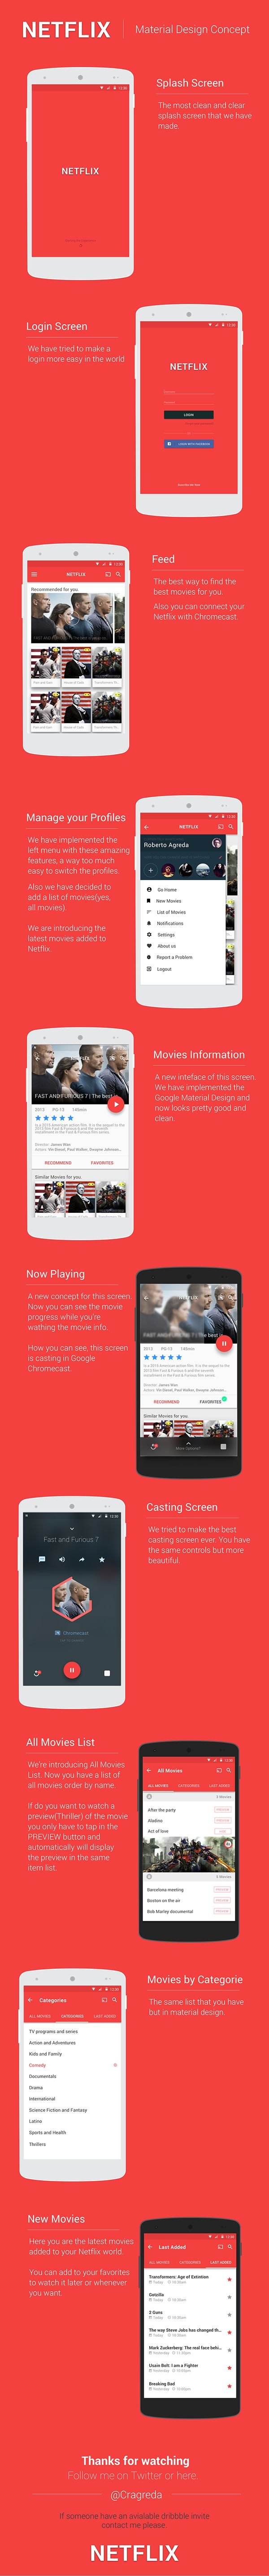 Netflix Material Design Redesign on Behance